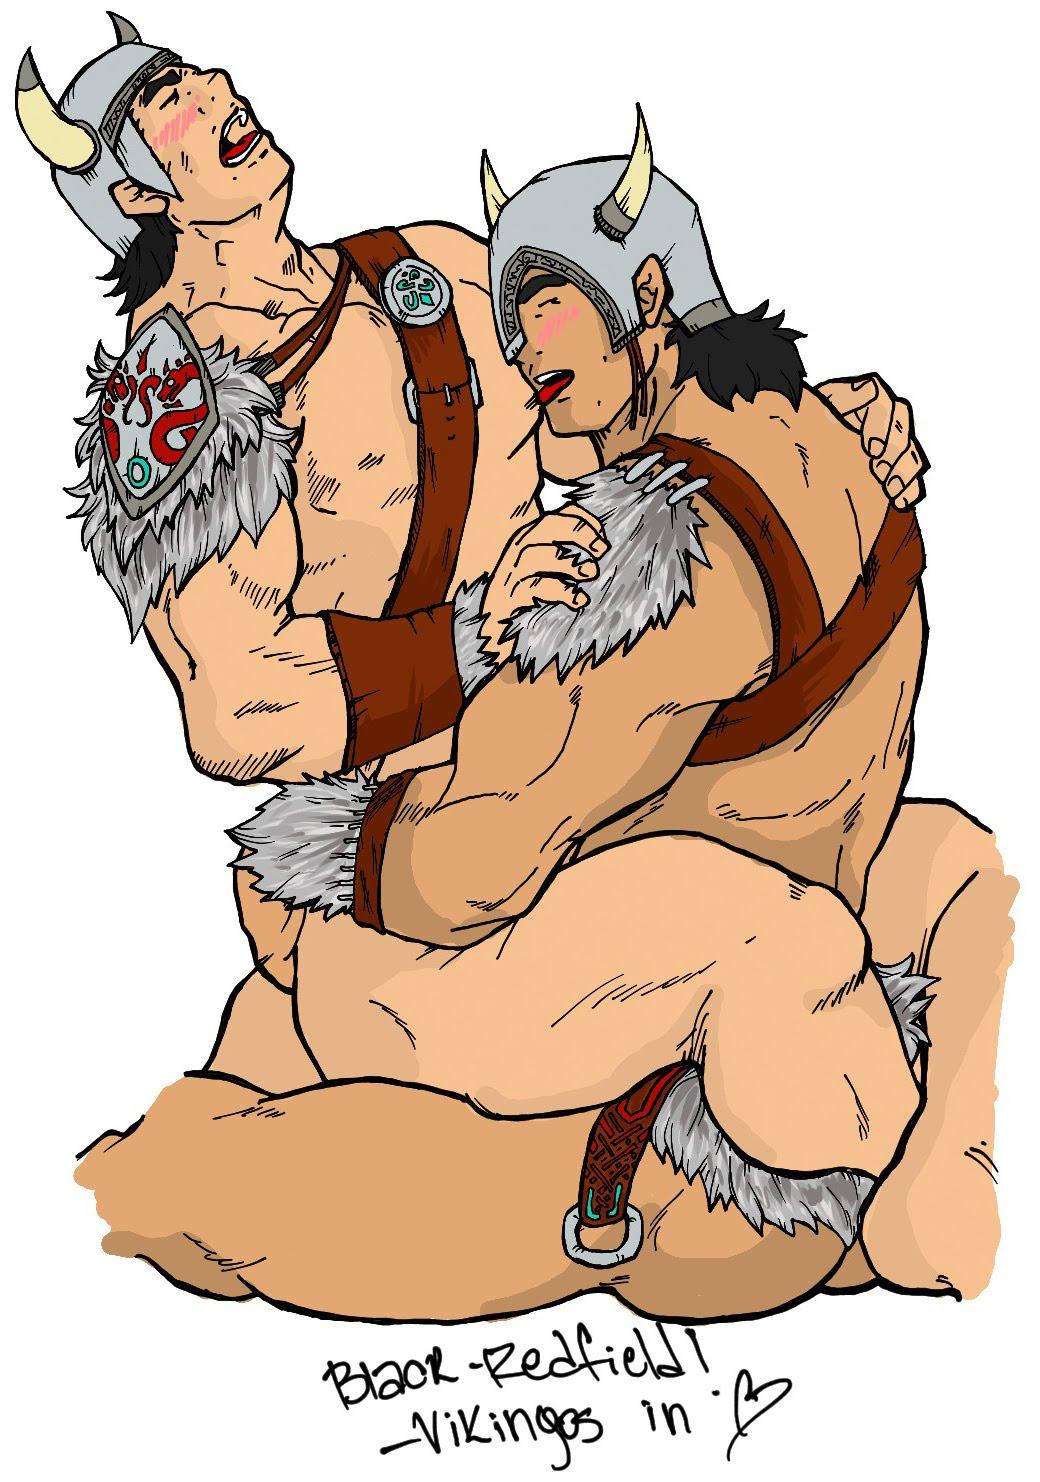 vikingi-gey-porno